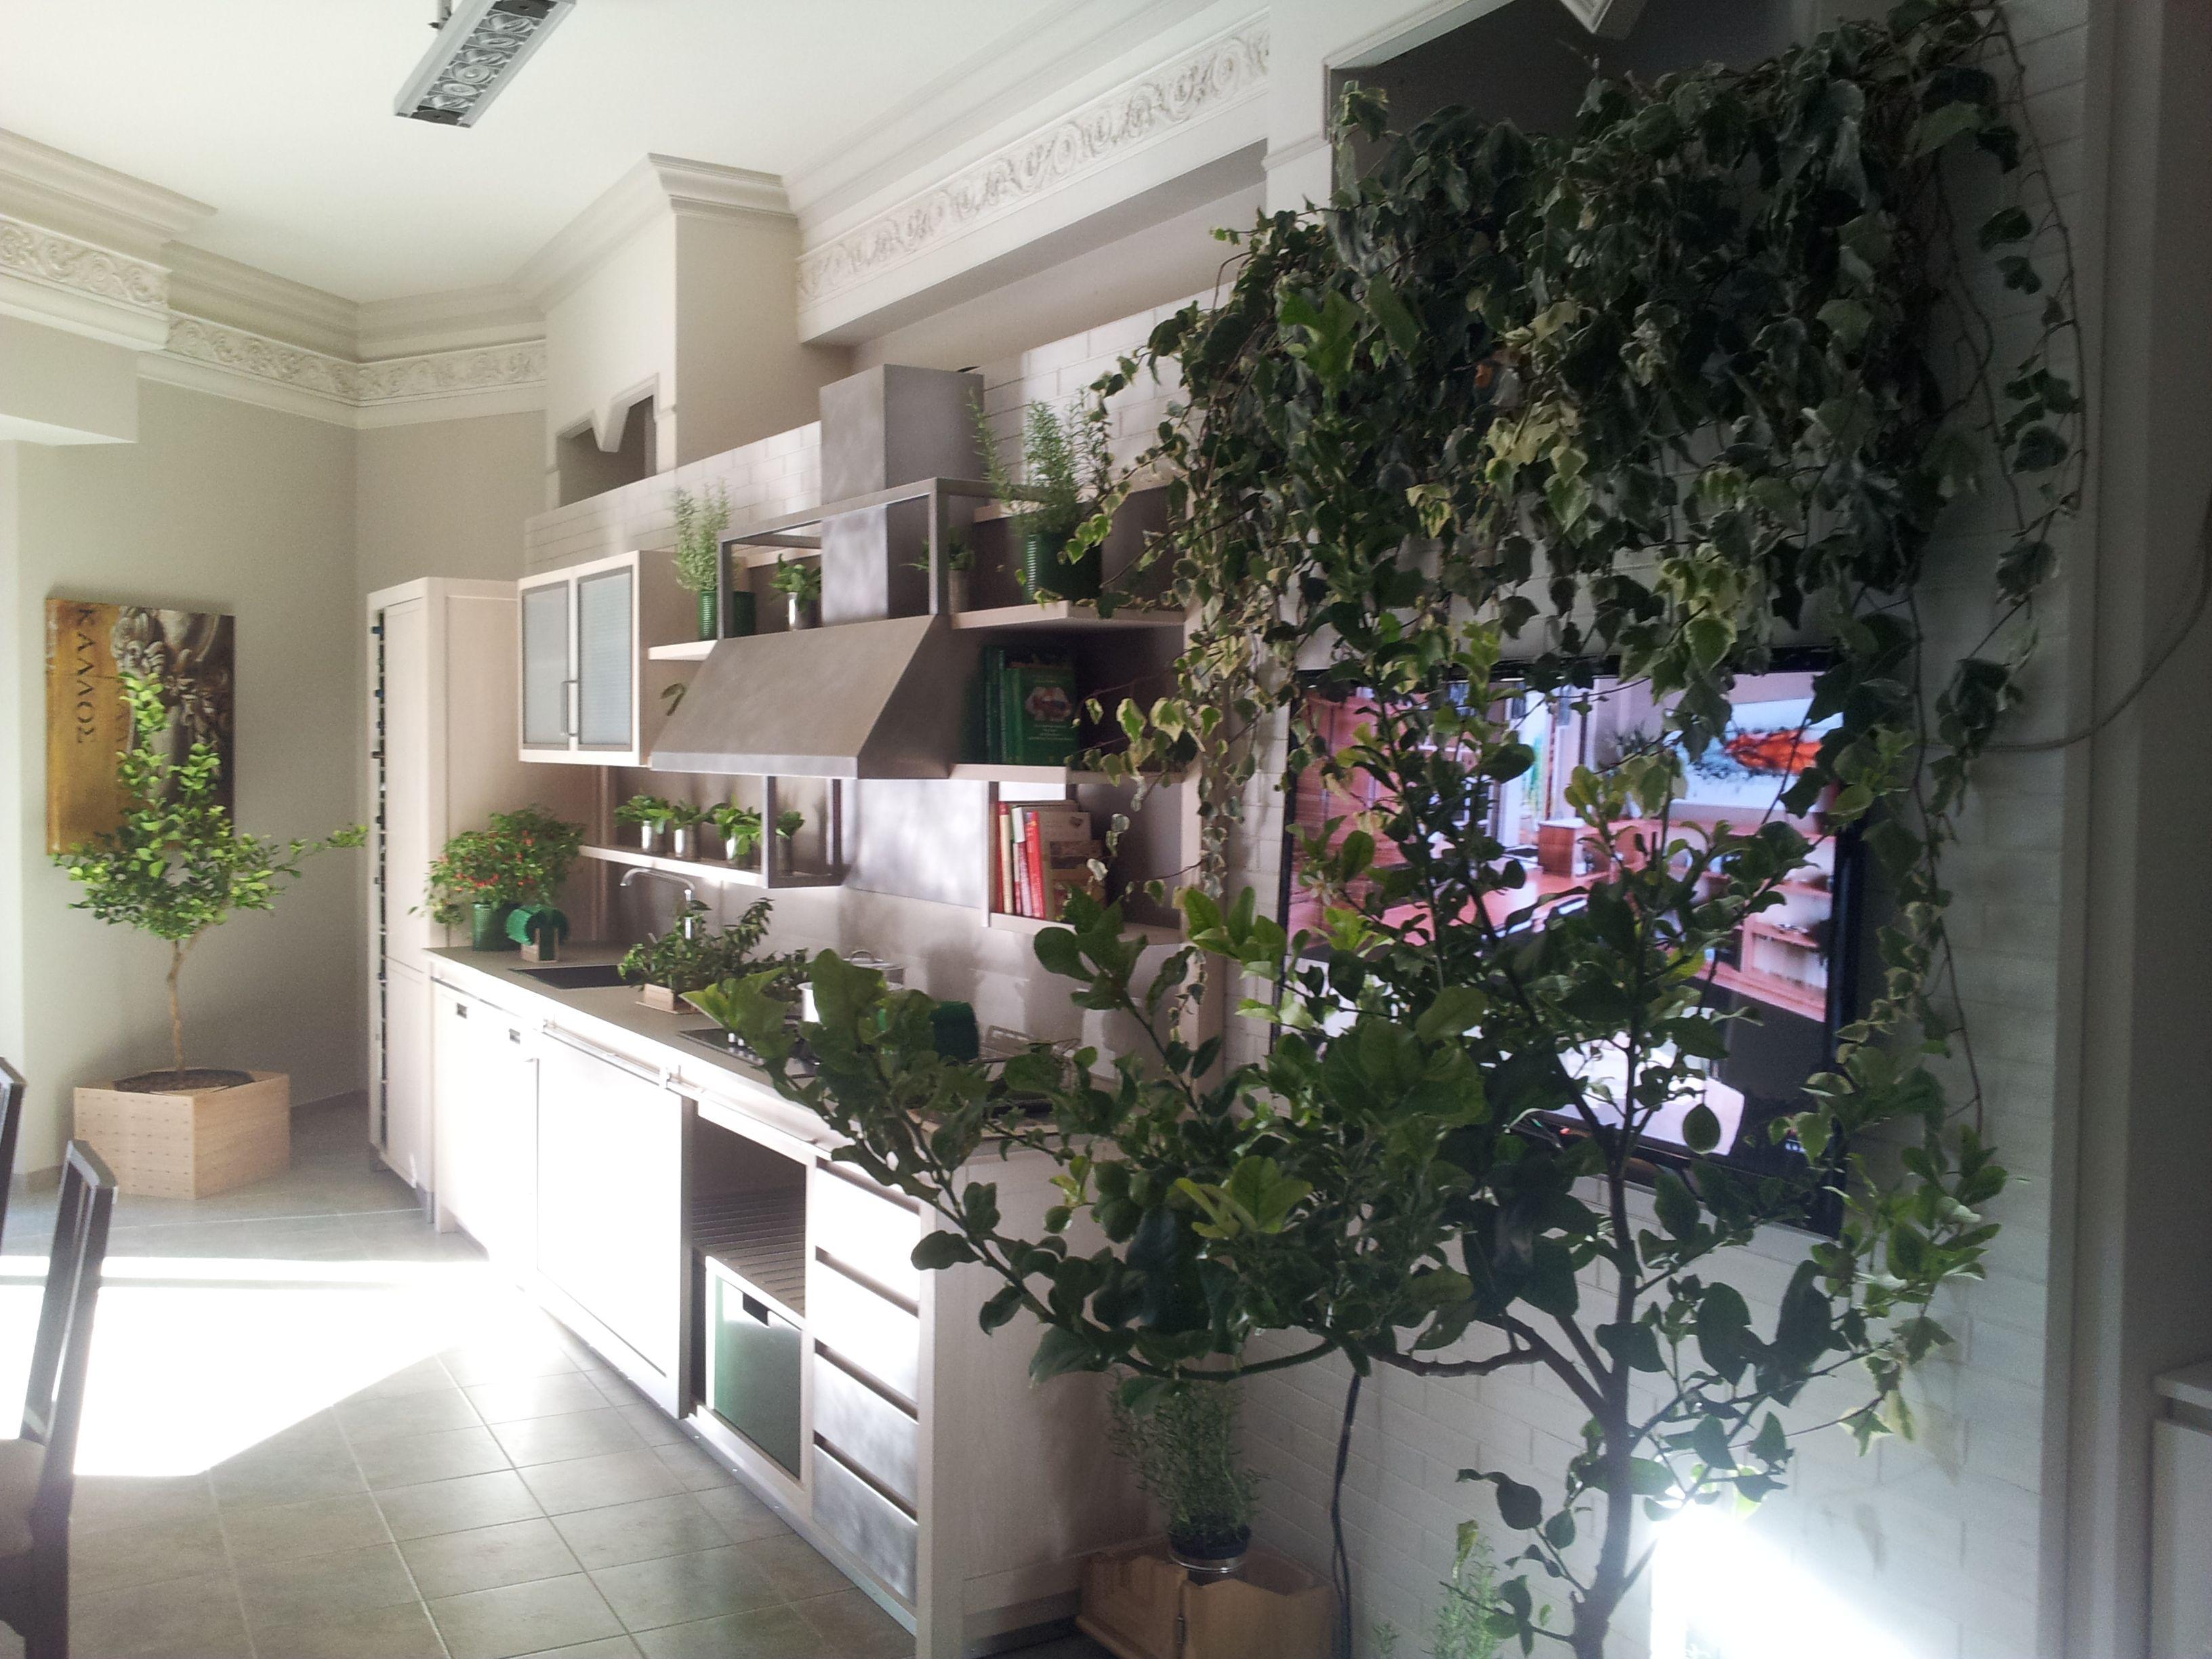 Cucina L\'ottocento Industrial Chic   CUCINE STILE INDUSTRIAL CHIC ...